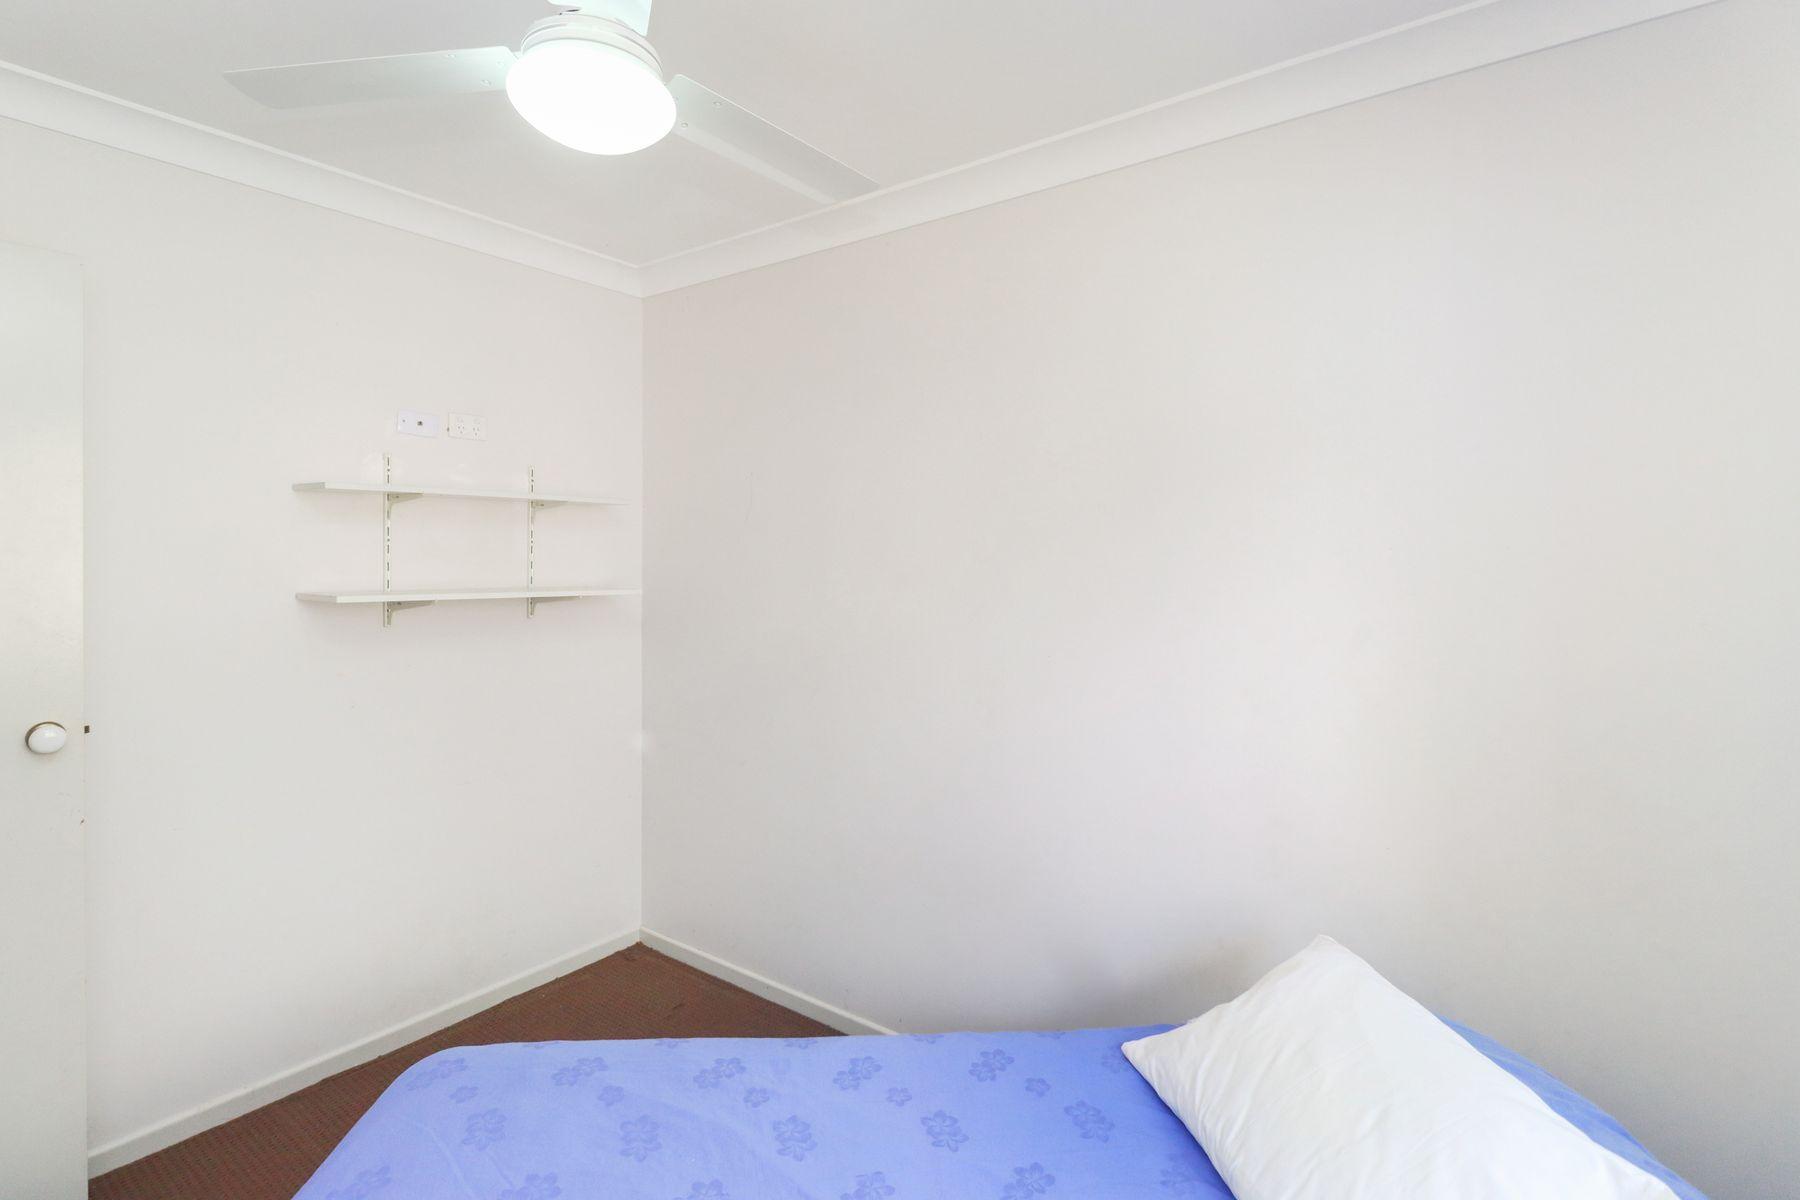 28 Julie Anne Street, Urraween, QLD 4655